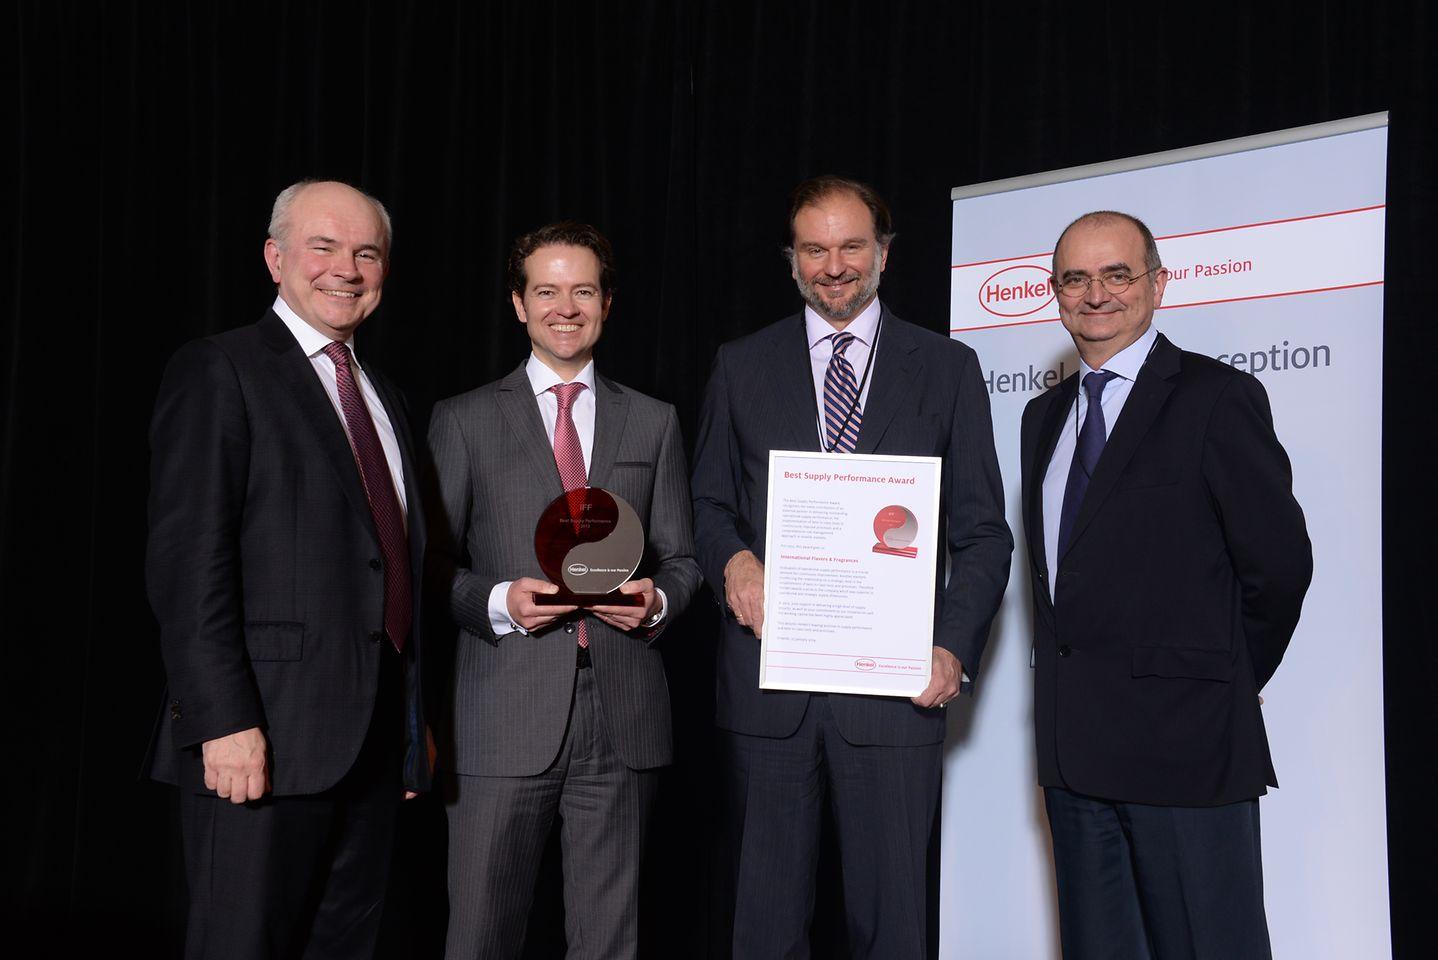 Bertrand Conquéret, Axel Schröter, Nicolas Mirzayantz, Jean-François Dupont